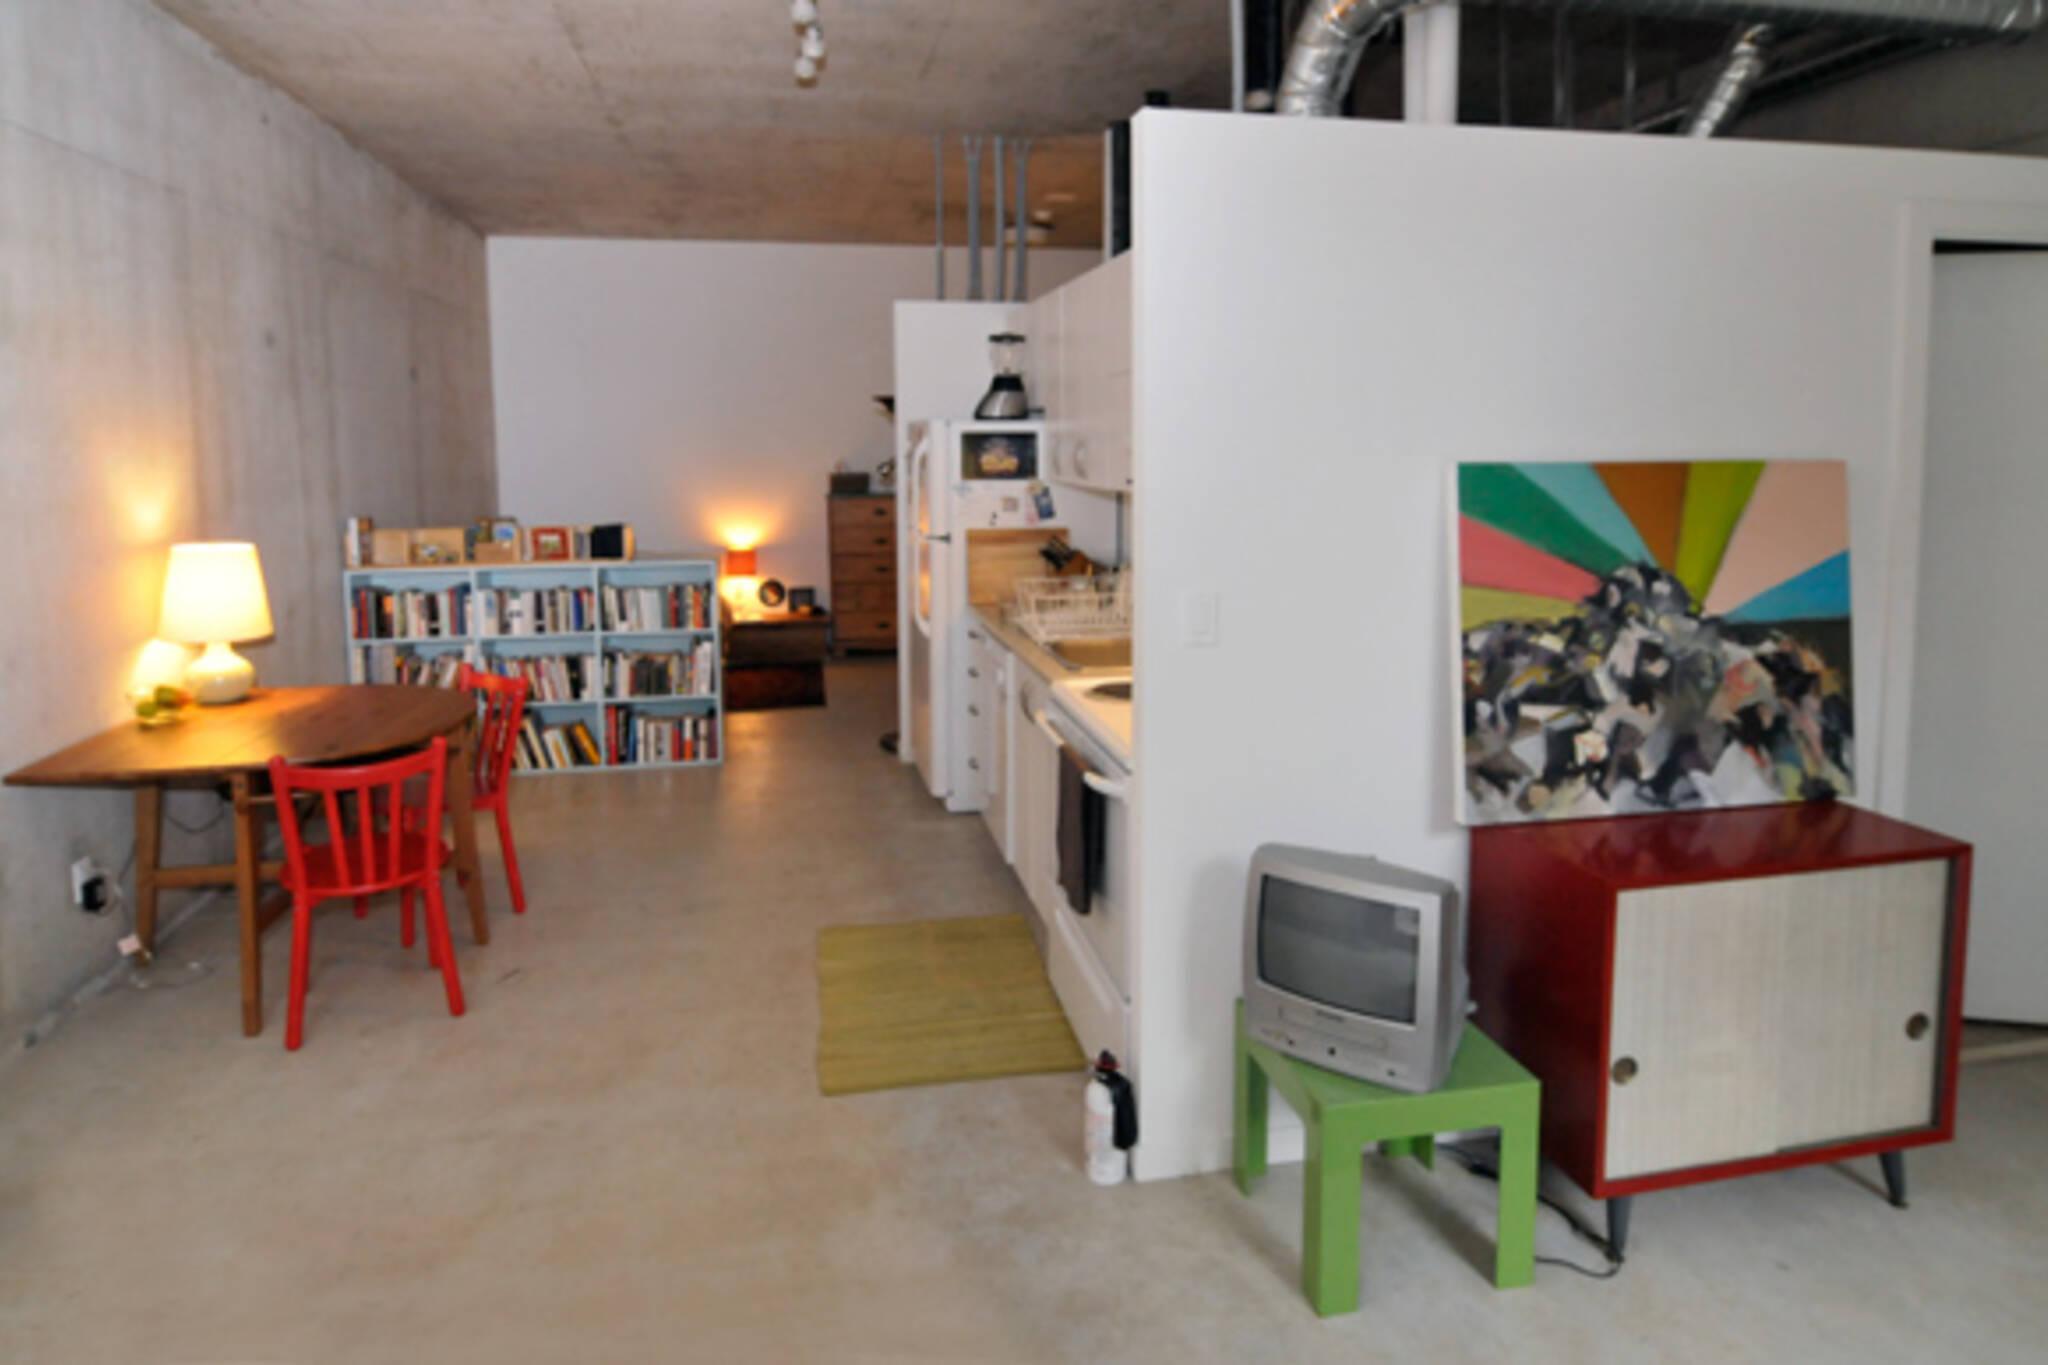 Artscape Gallery Lofts